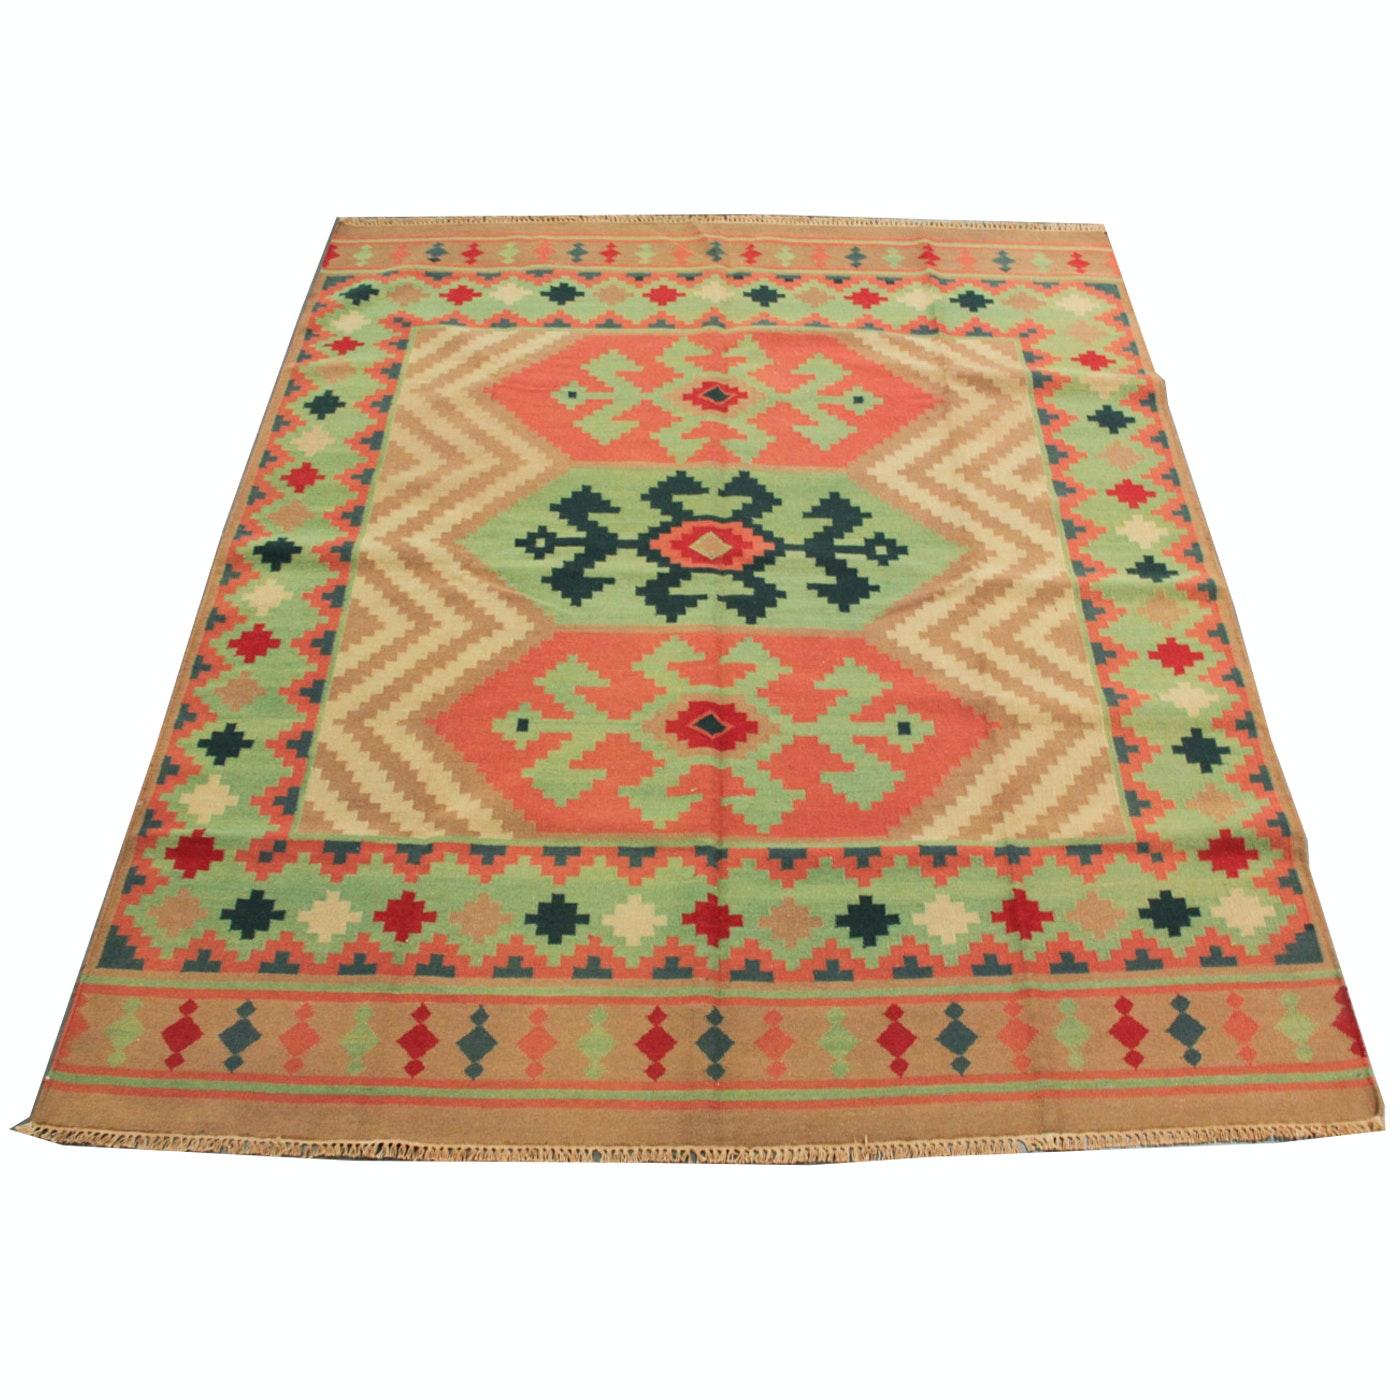 Hand-Woven Indian Kilim Area Rug